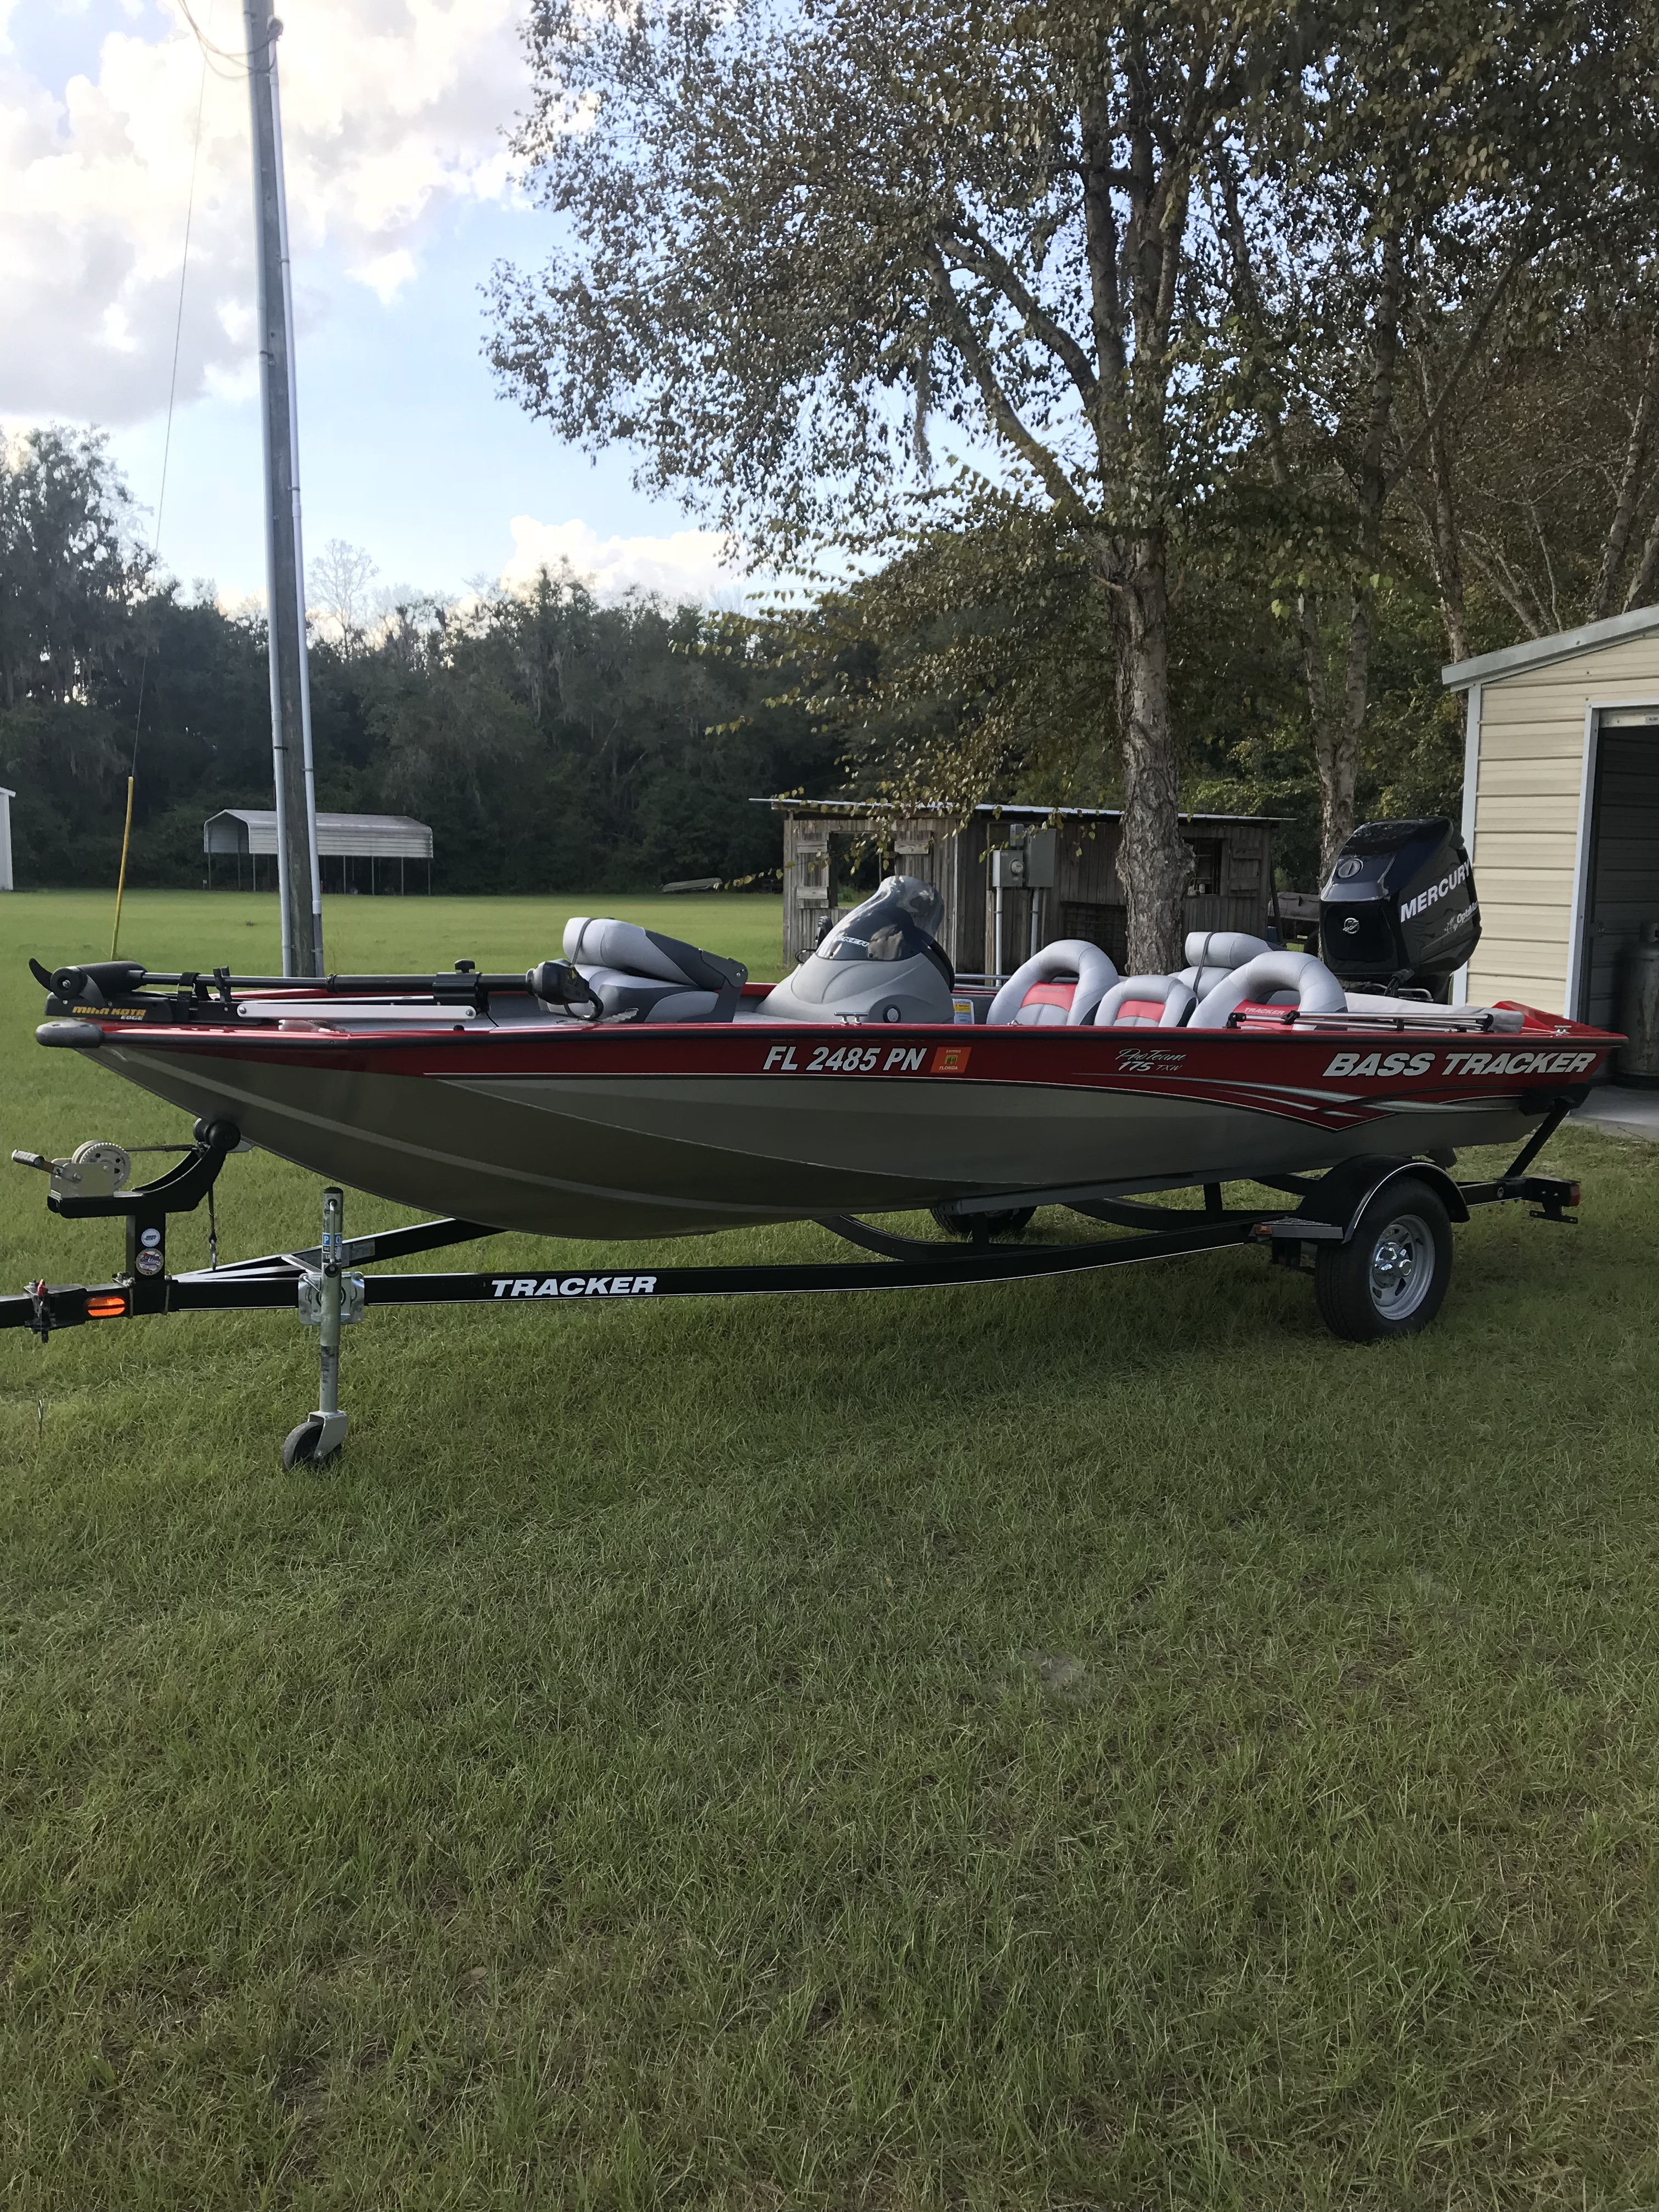 2013 bass tracker 175 pro team — Florida Sportsman